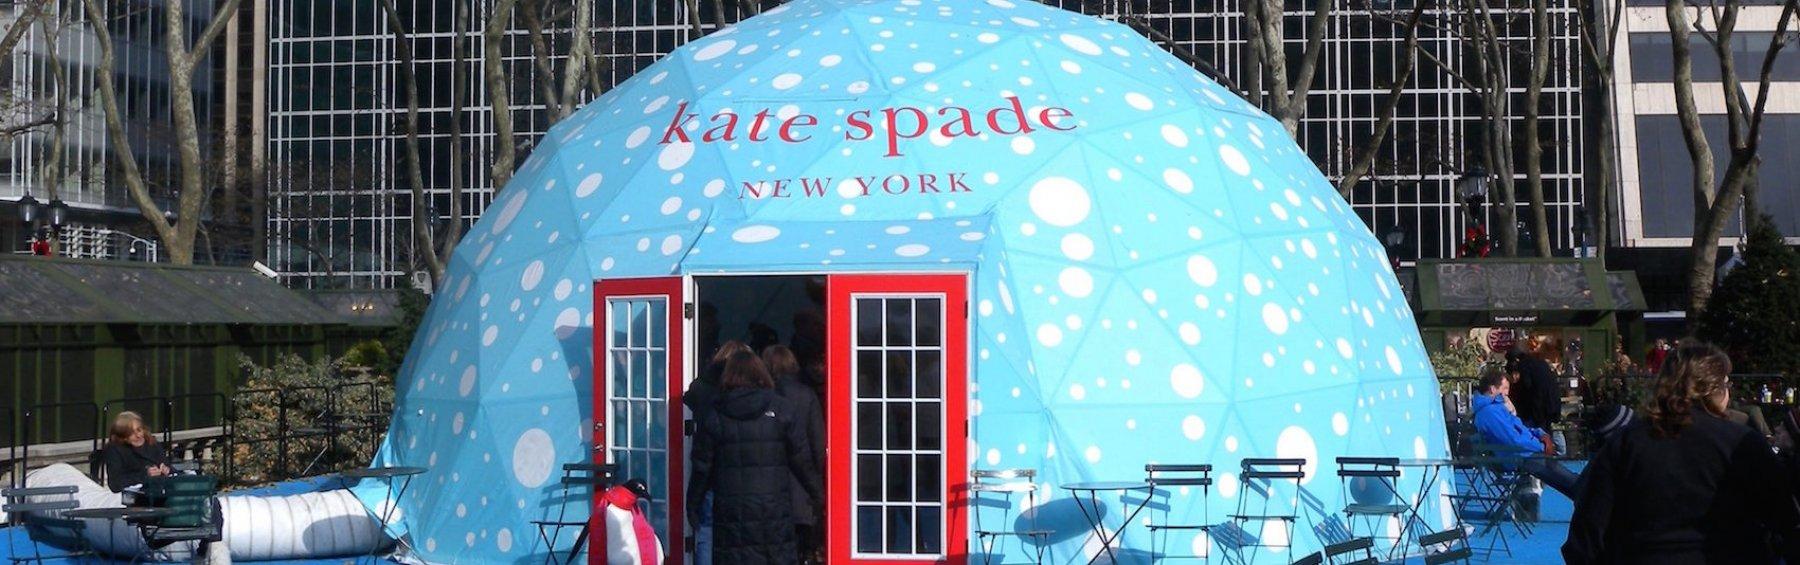 Kate Spade dome Bryant Pk jeh 1